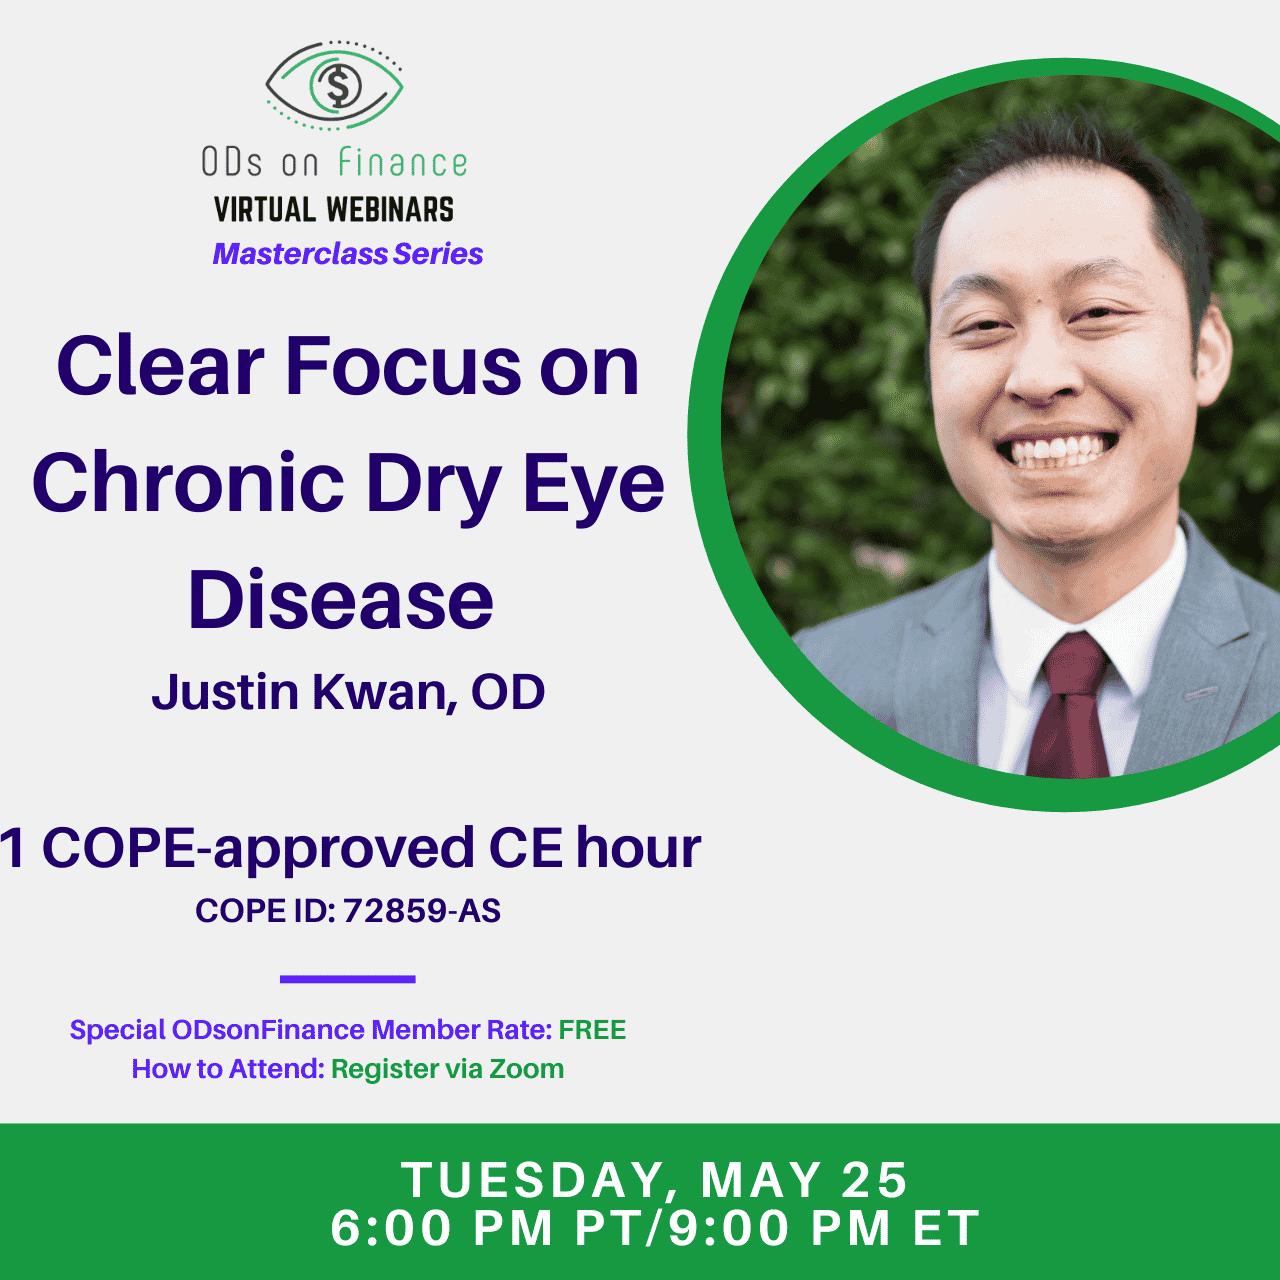 Clear Focus on Chronic Dry Eye Disease (2)